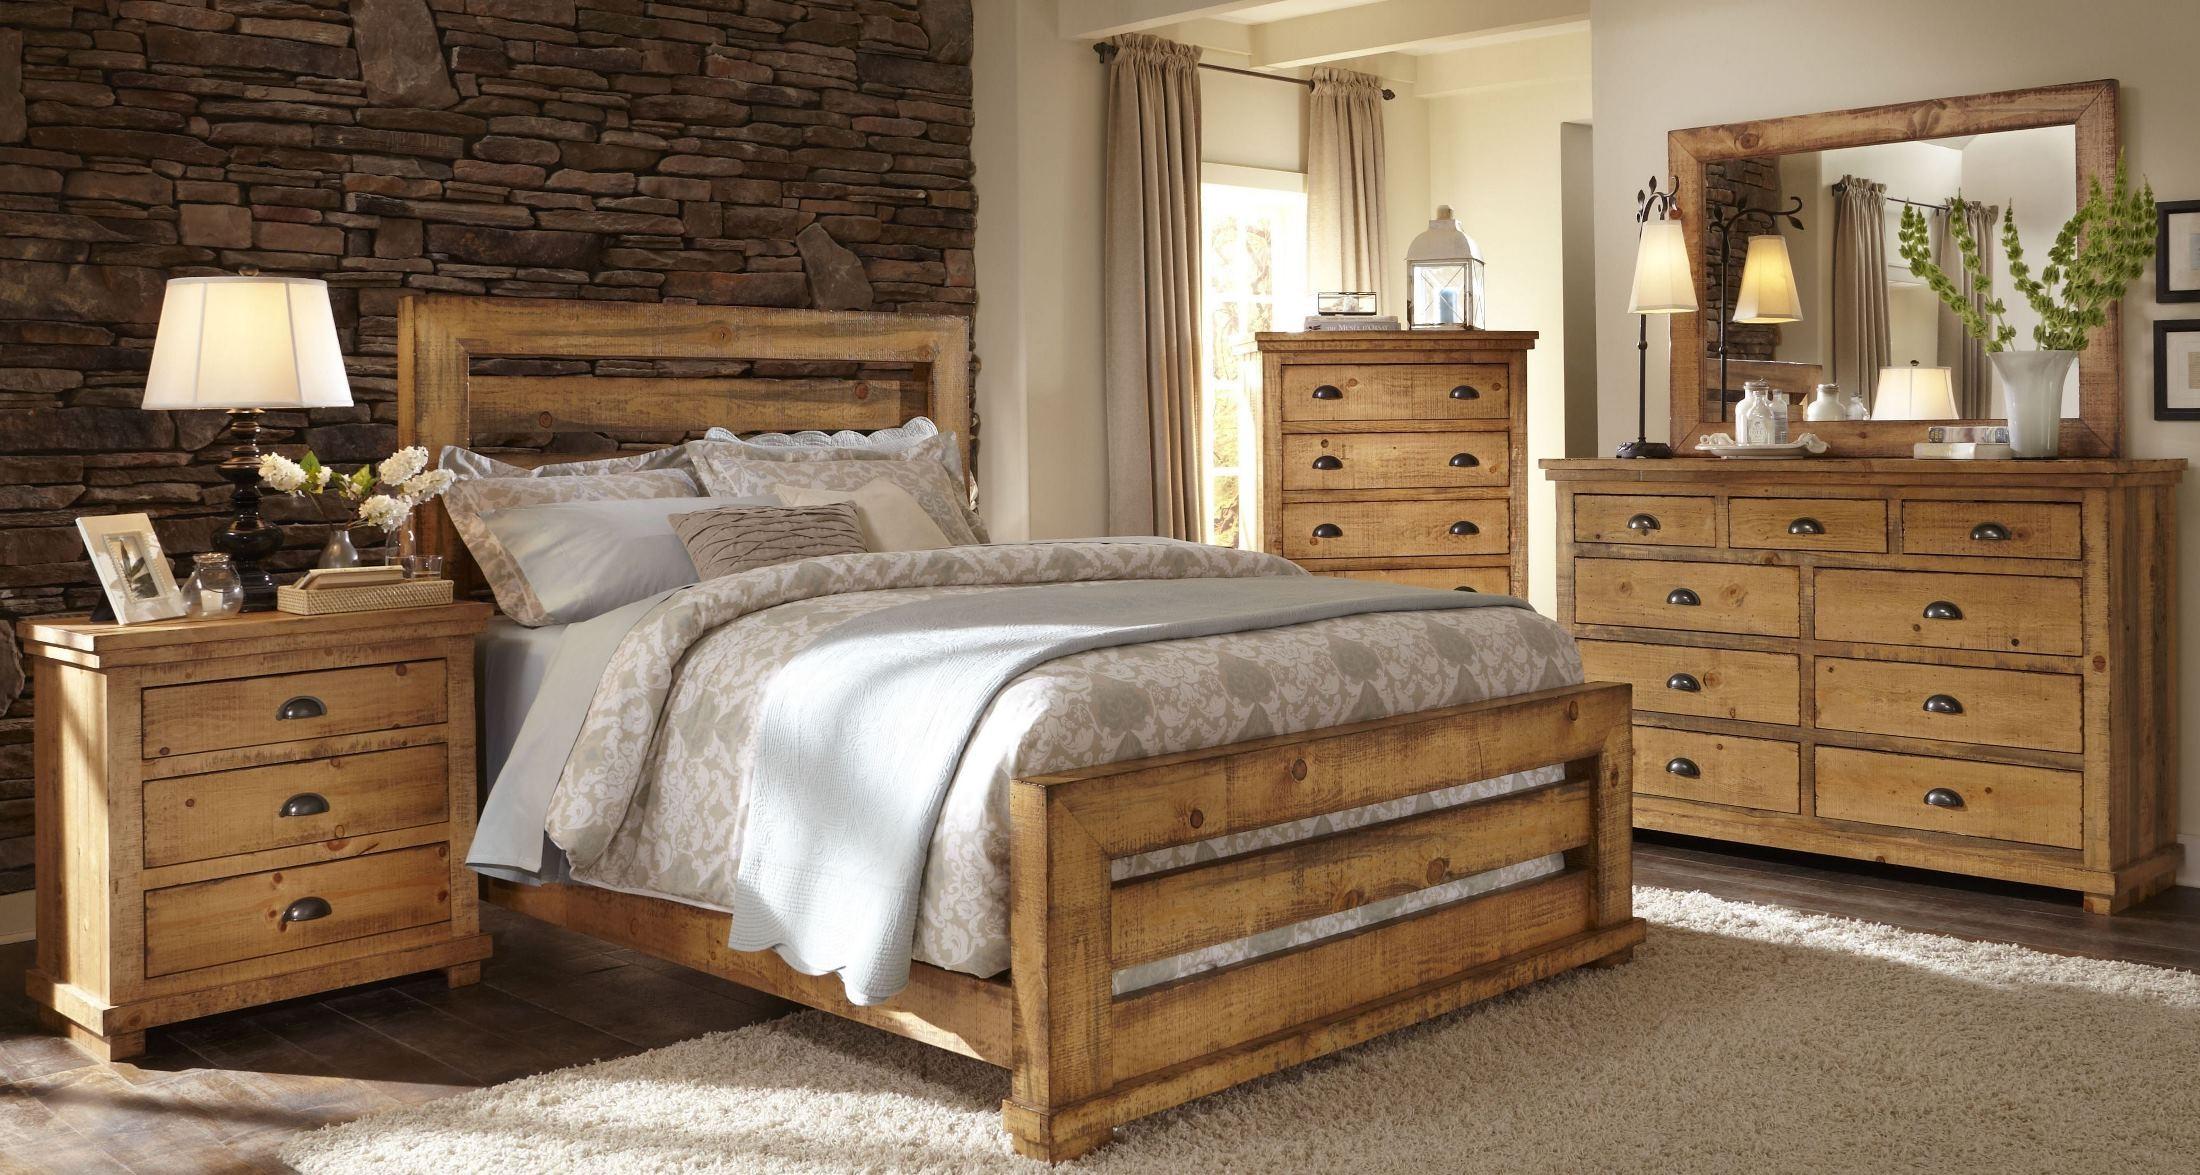 bedroom furniture bedroom sets willow distressed pine slat bedroom